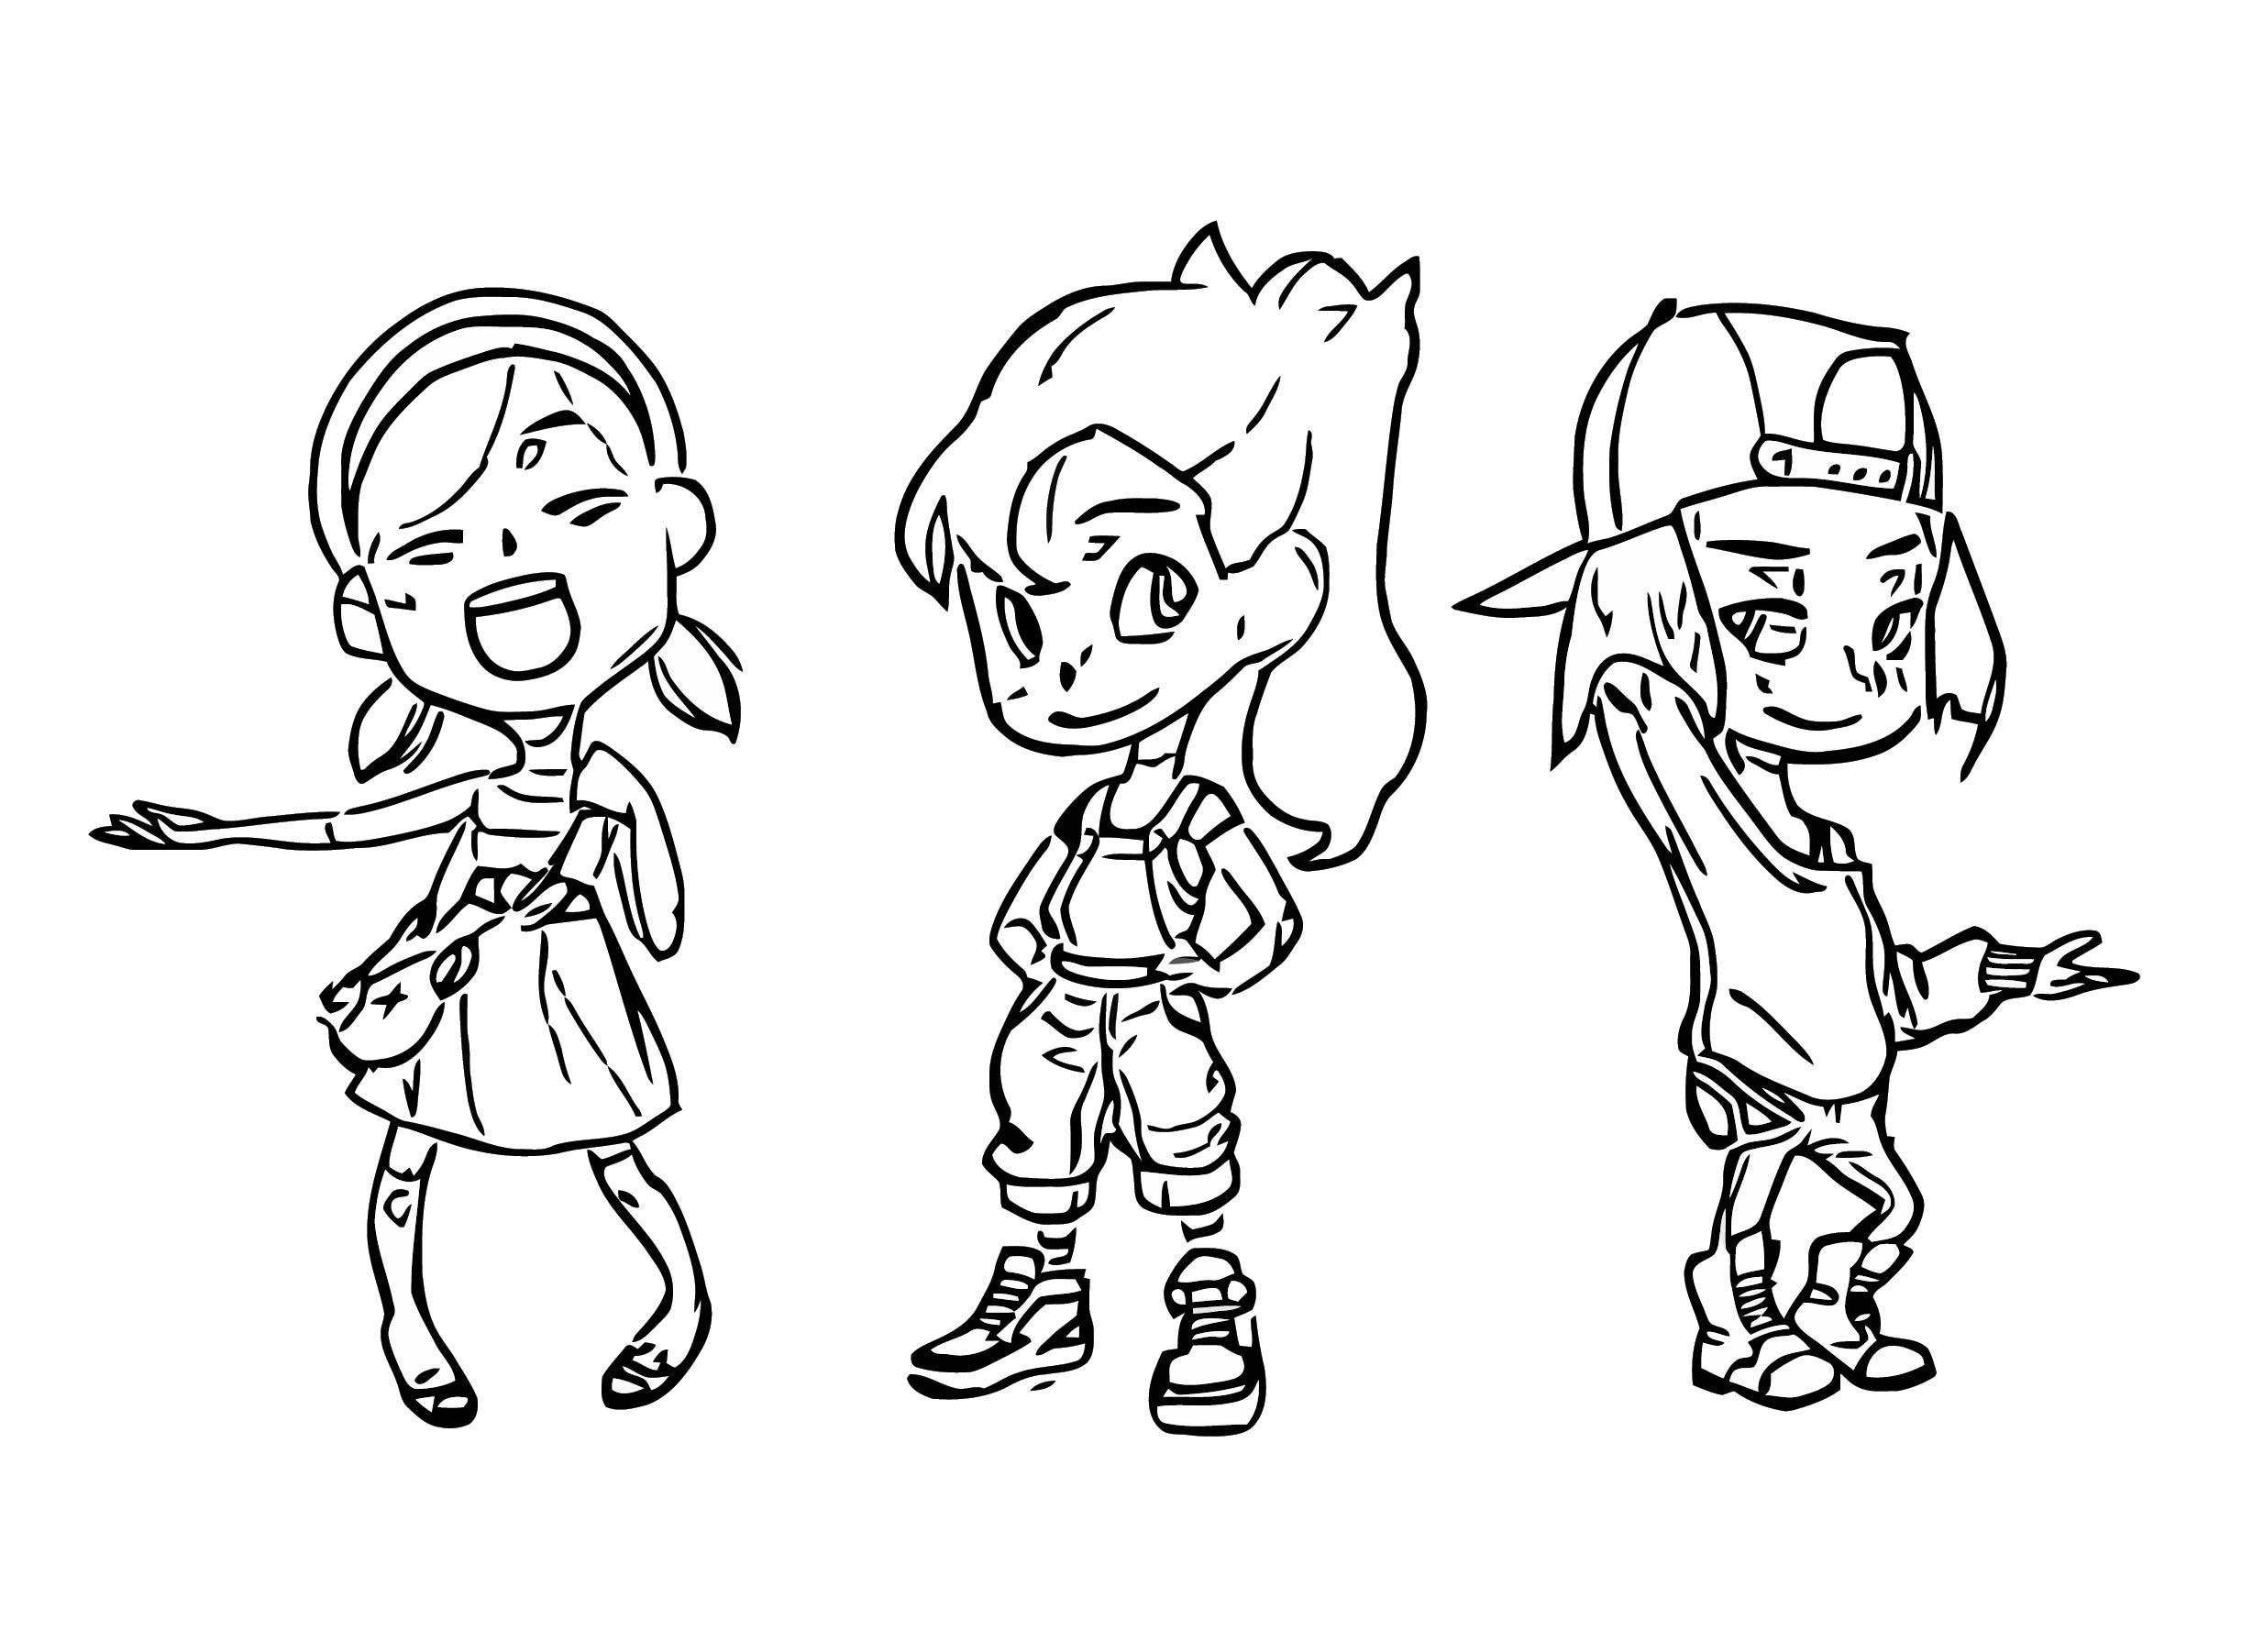 Russell Del Socorro Powerpuffgirls Cartoonize Coloring Page